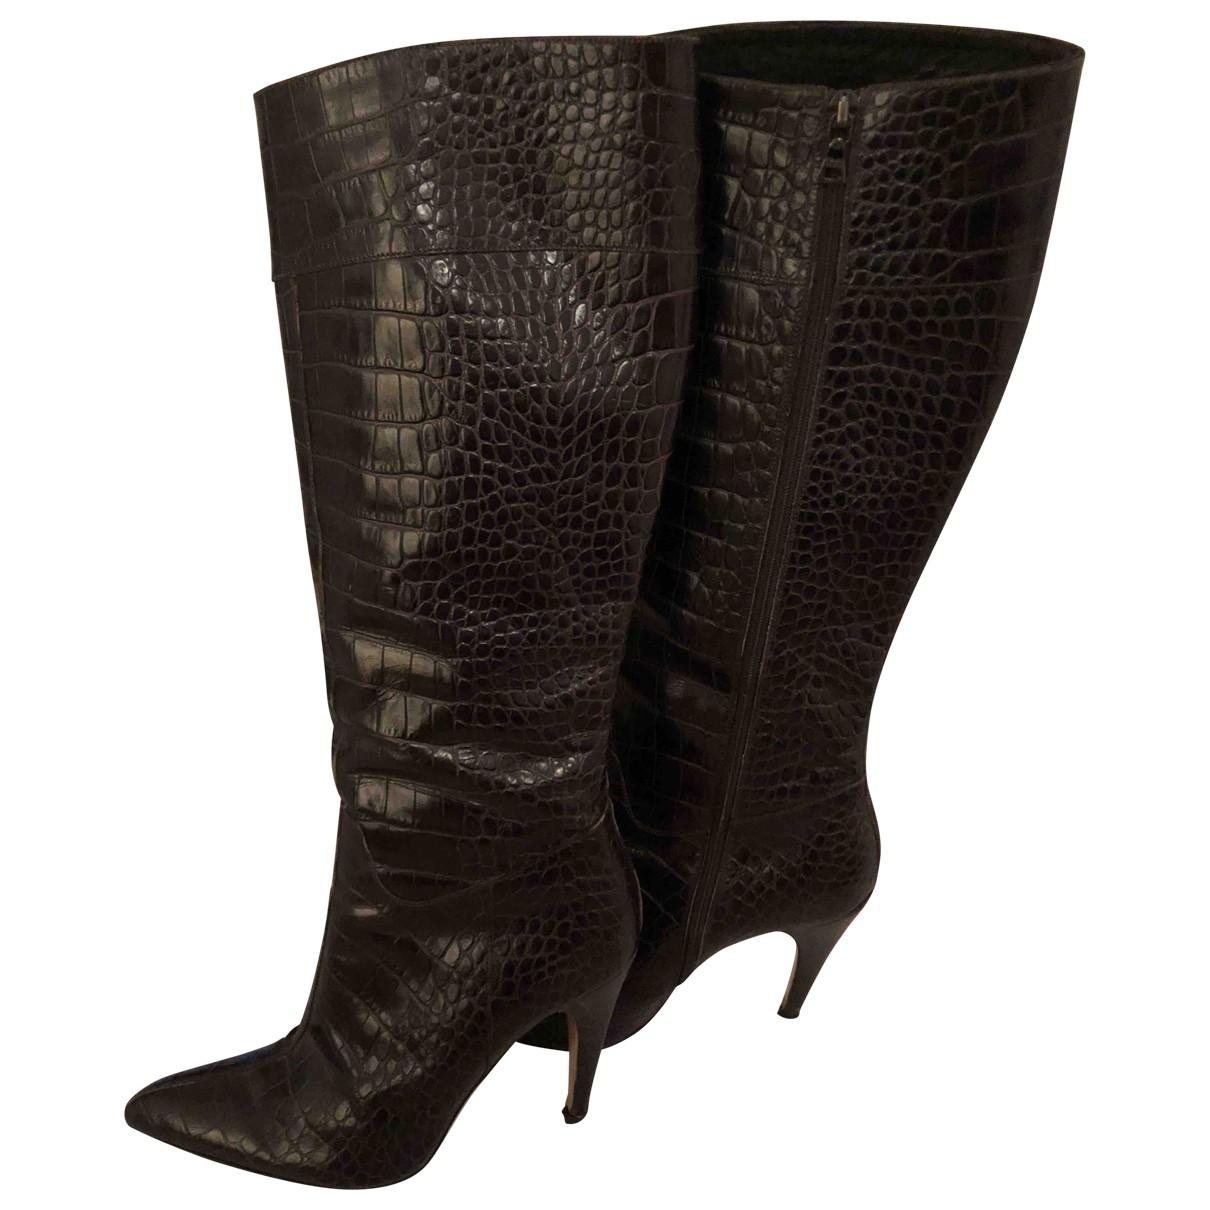 Prada - Bottes   pour femme en alligator - marron